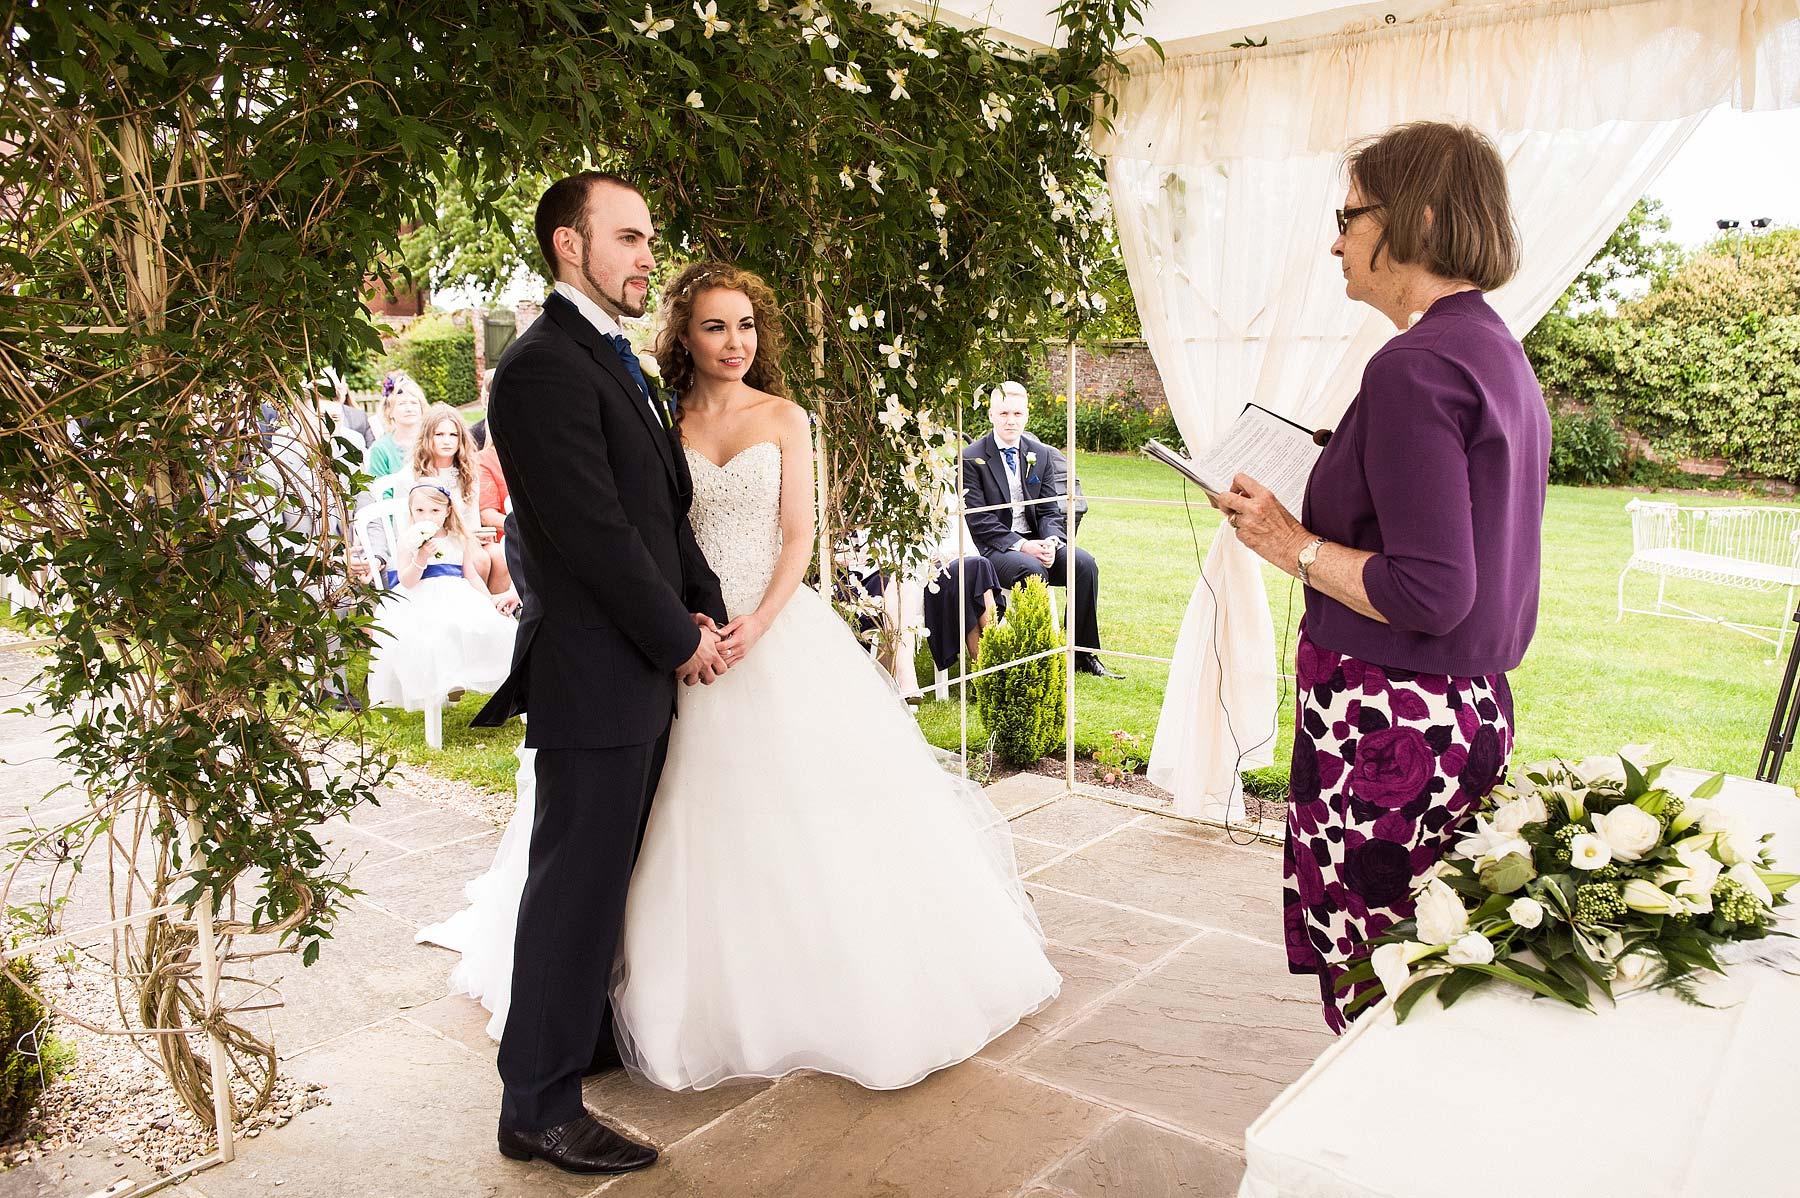 albright-hussey-manor-wedding-photographers-026